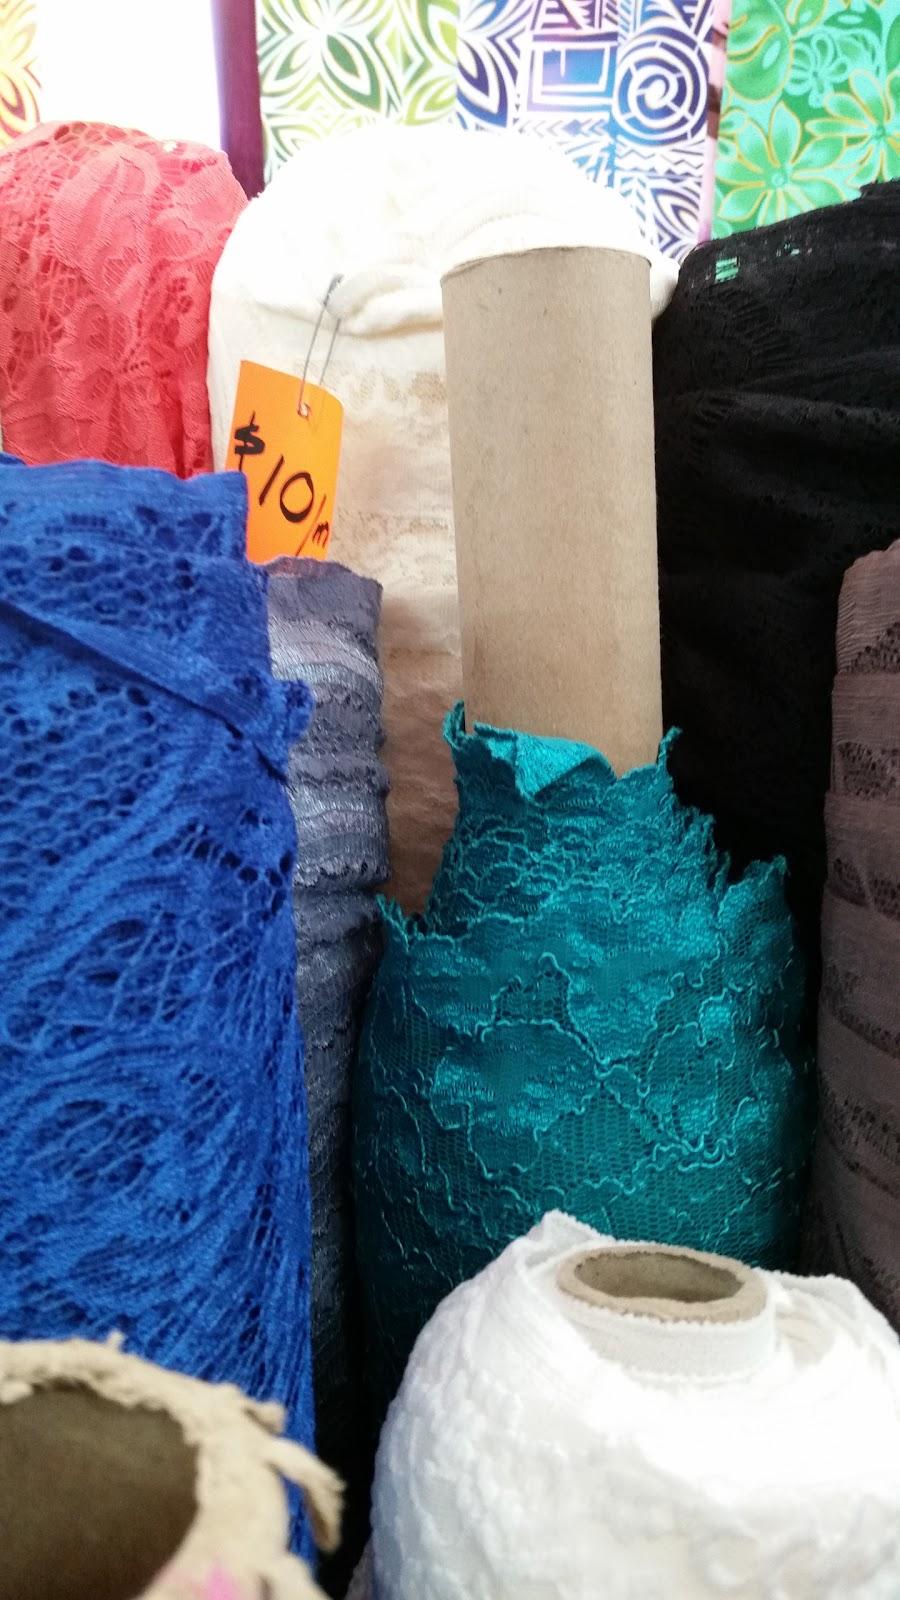 My Fabrics Warehouse   clothing store   6/62 Hume Hwy, Lansvale NSW 2166, Australia   0297235999 OR +61 2 9723 5999